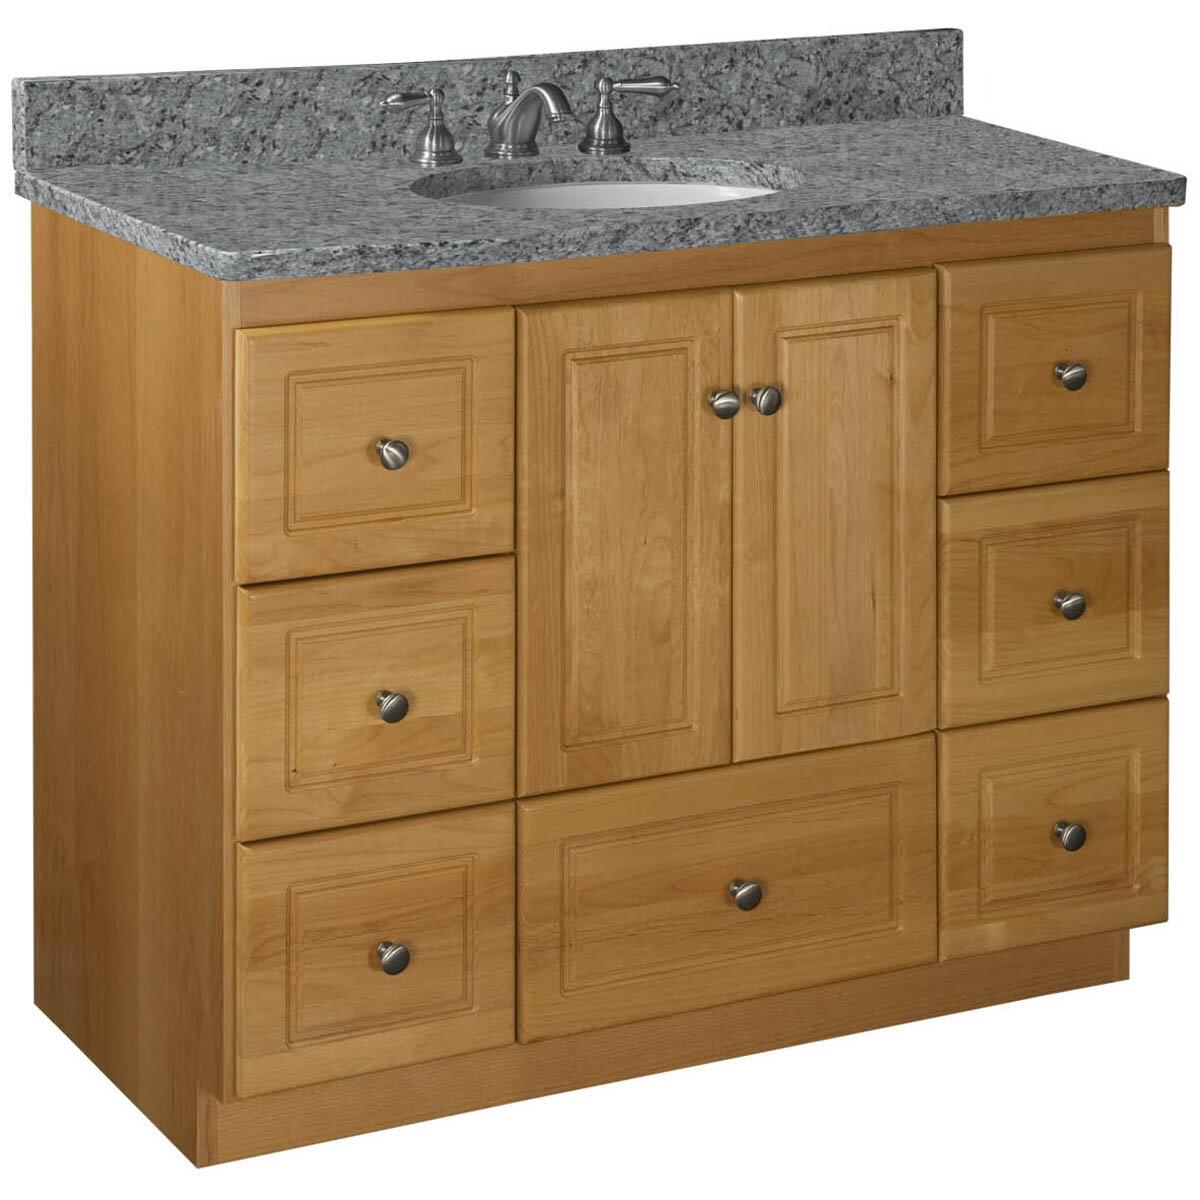 Strasser Woodenworks Simplicity 42 Single Cabinet